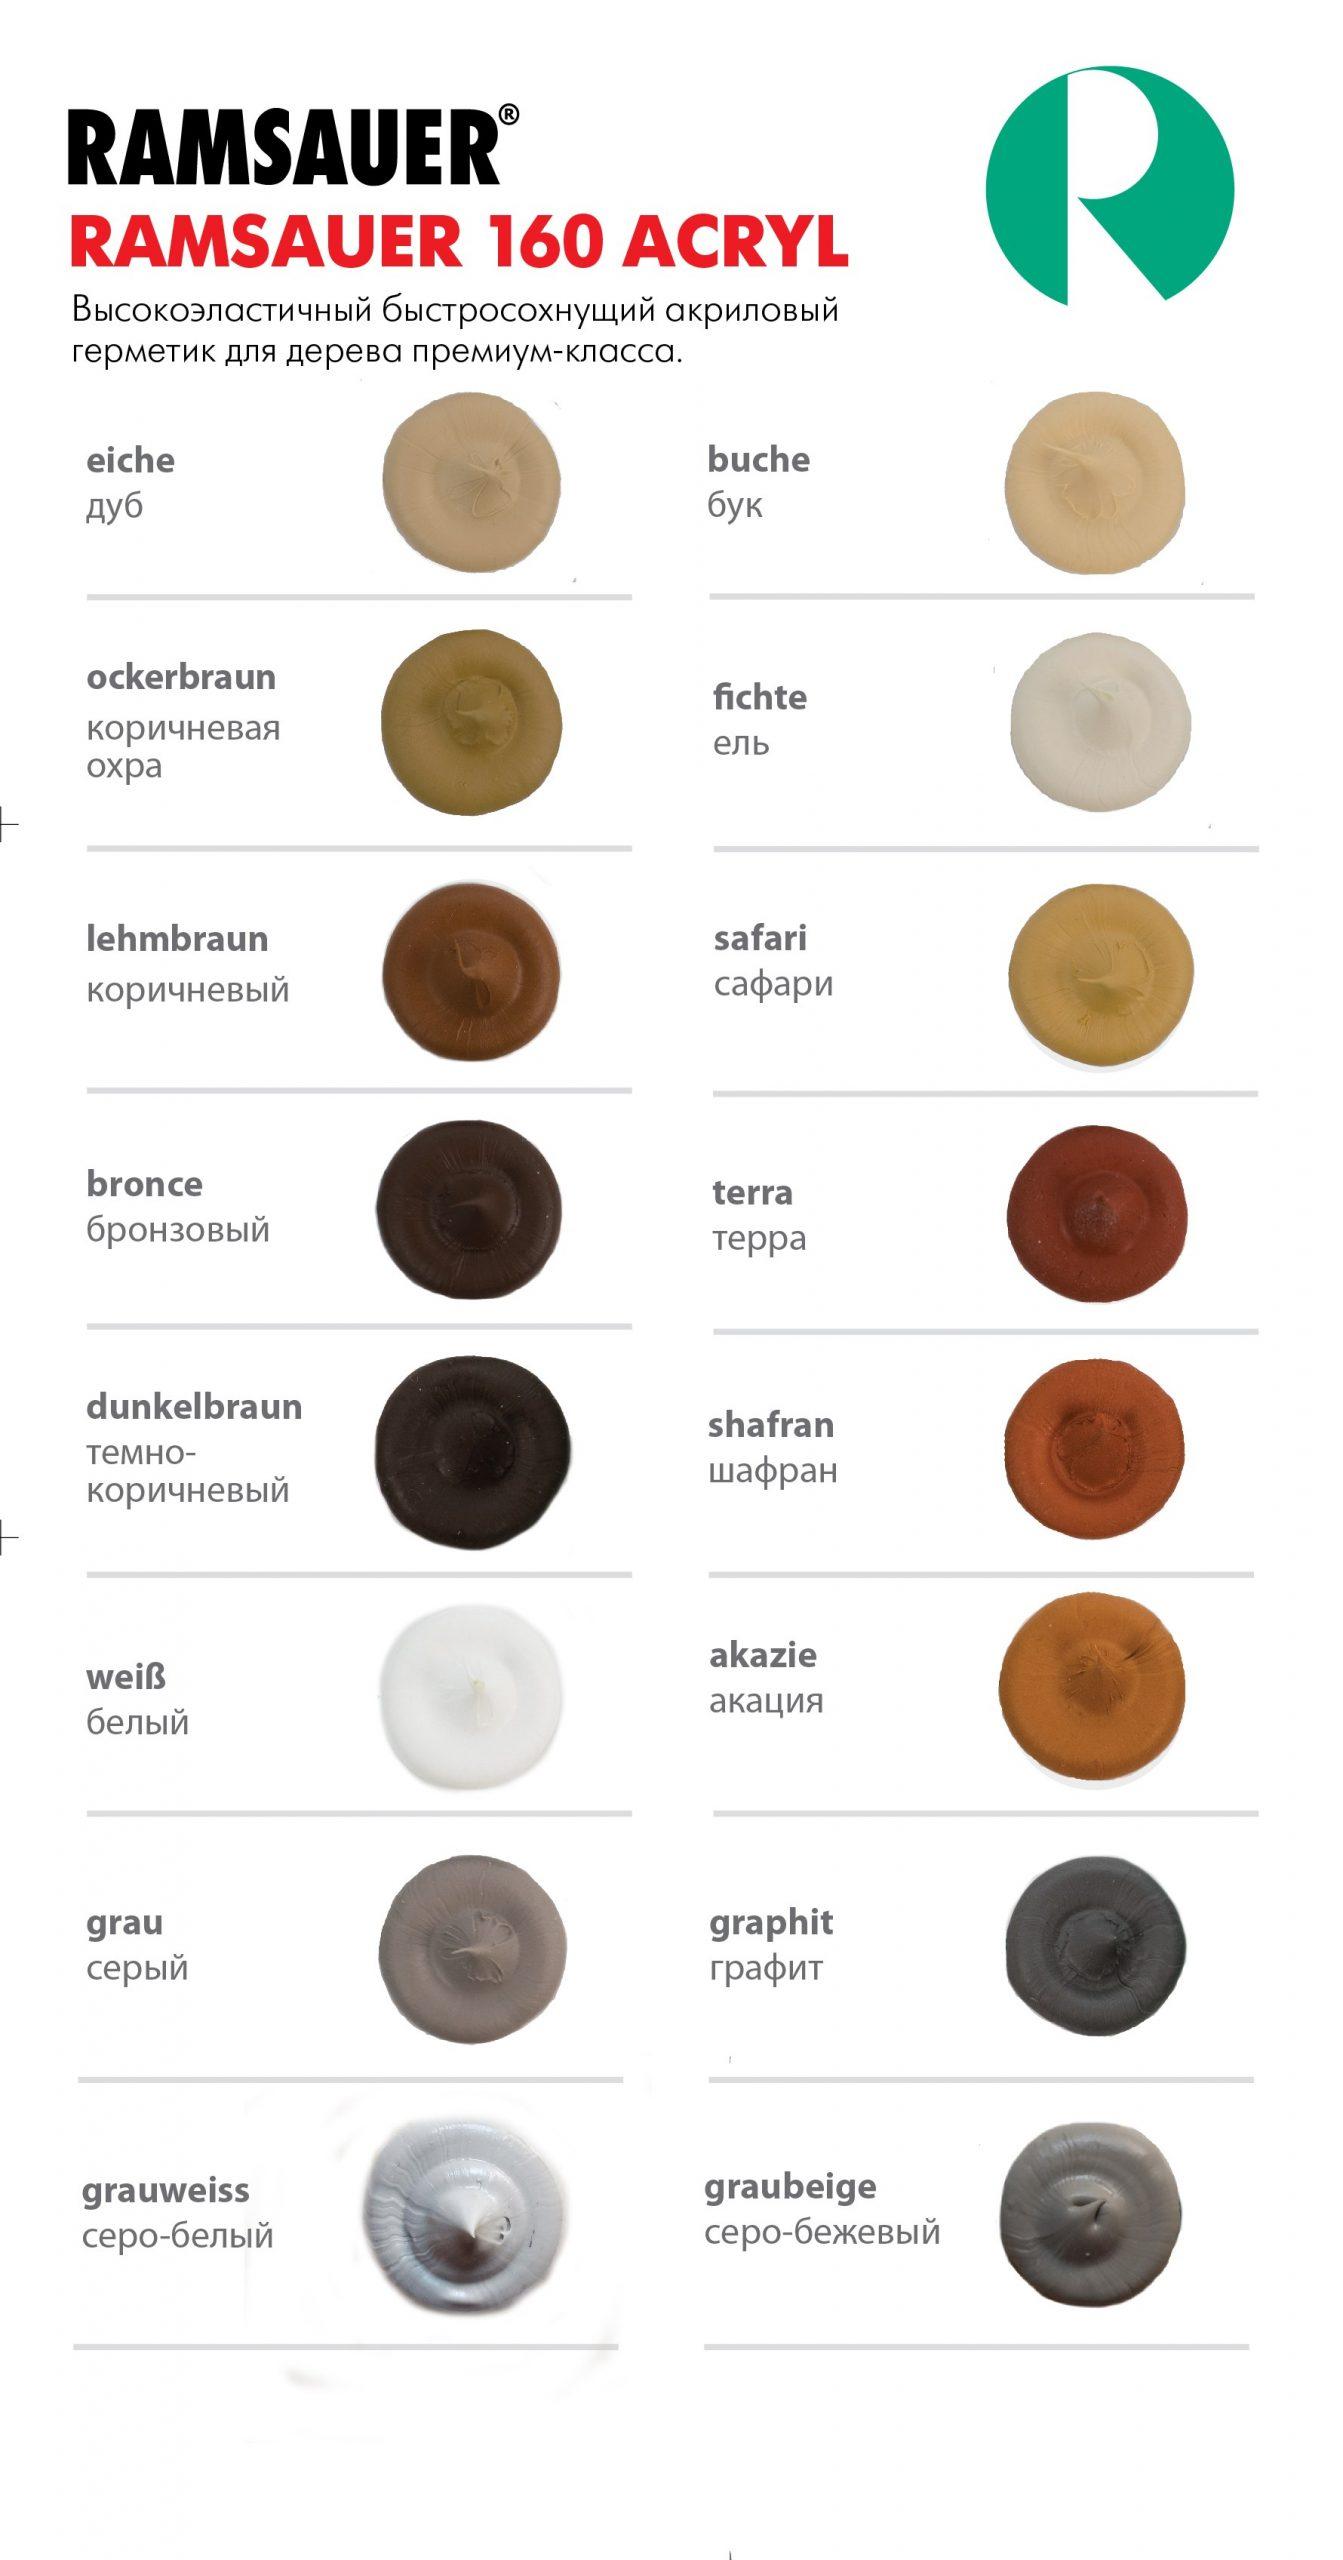 ramsauer 160 acryl цвета